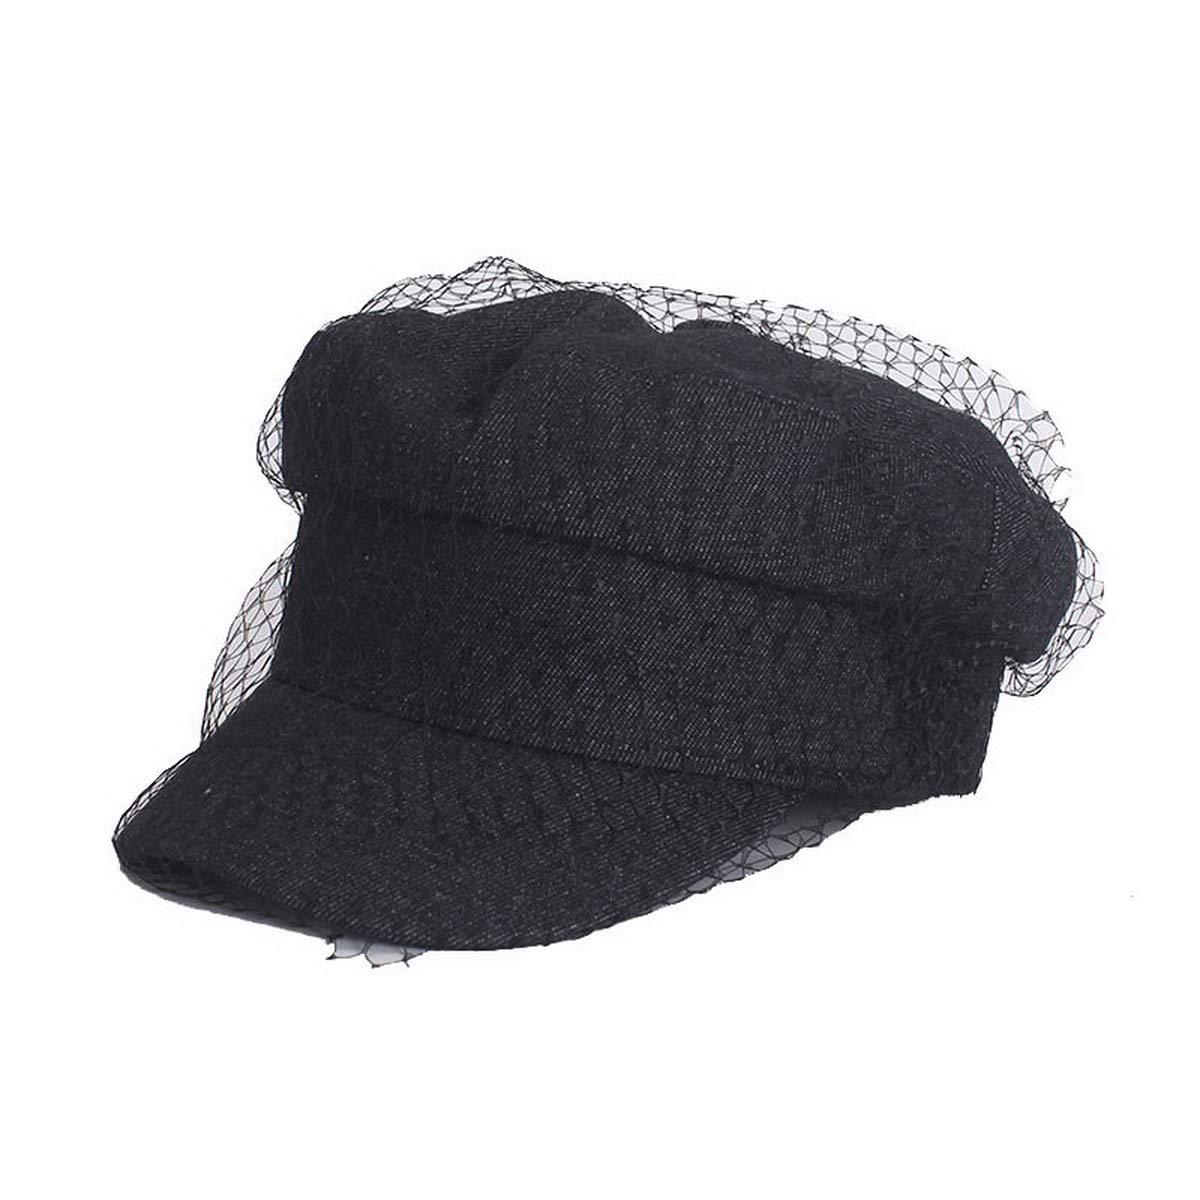 Visor Peaked Cap for Ladies Newsboy Cabbie Beret Mesh Net Veil Wedding Tea Party Baker Boy Beret-NW18009-Black